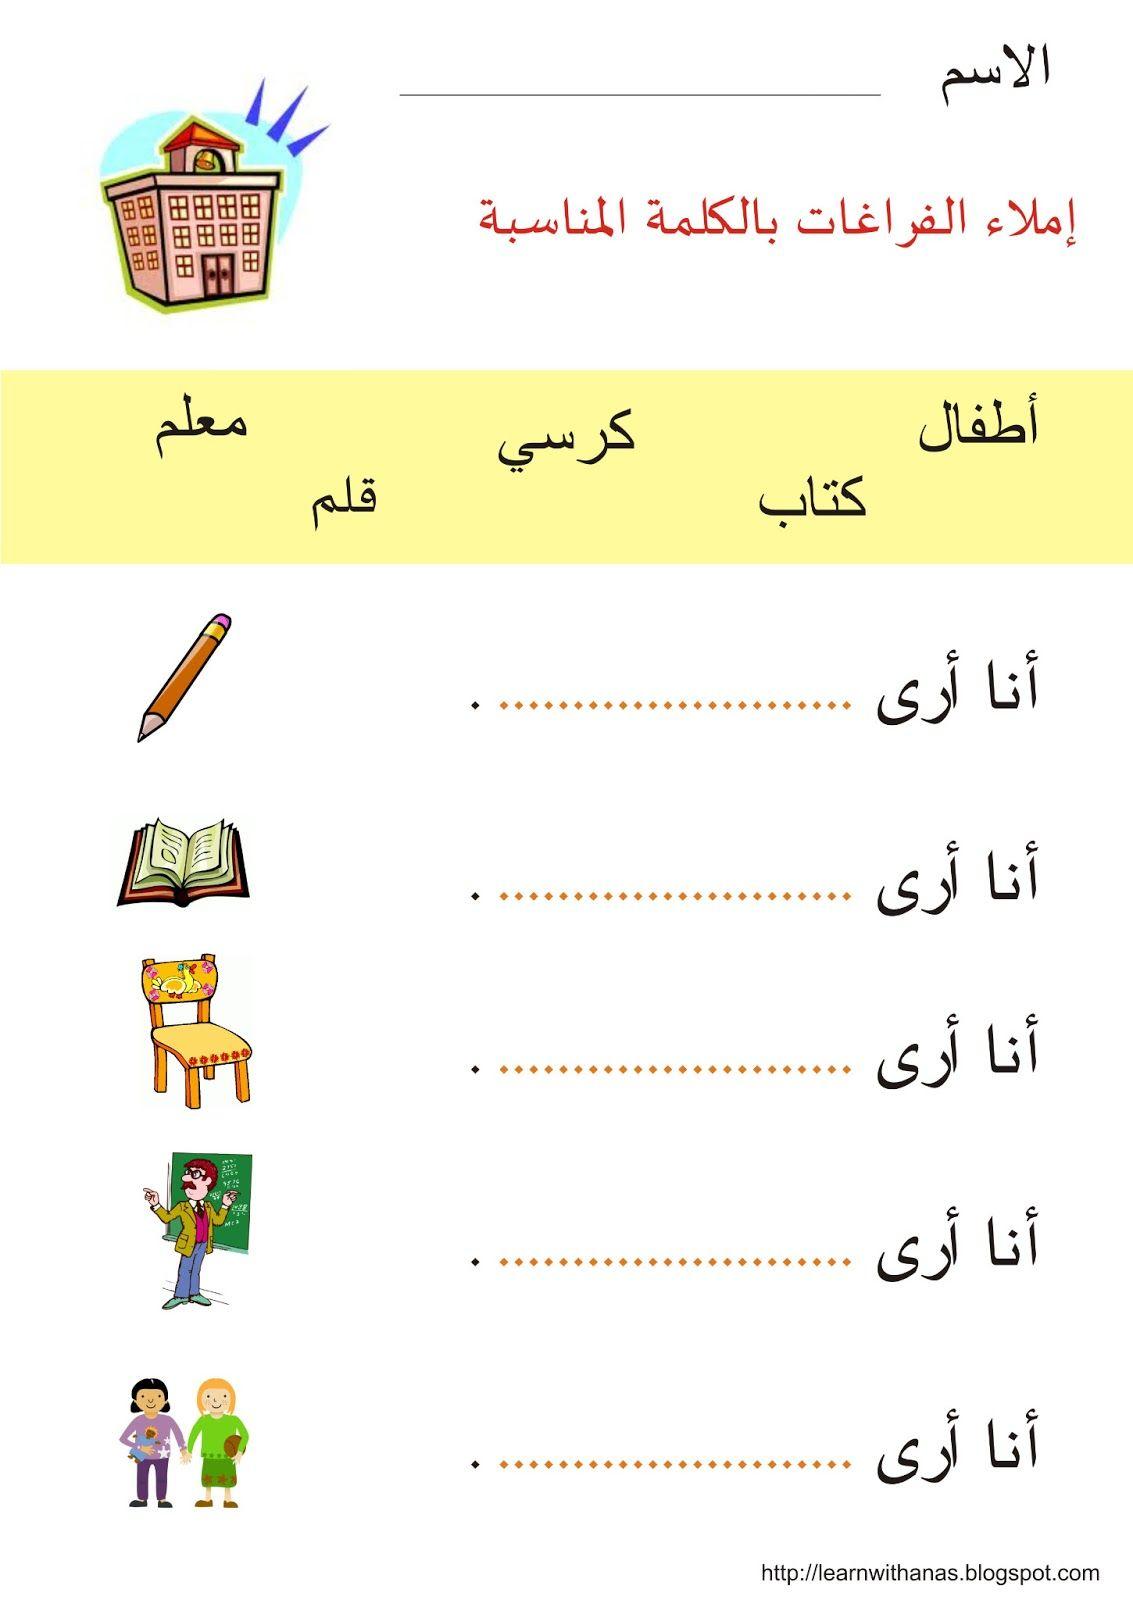 feladatlapok arabic pinterest learning arabic worksheets and arabic lessons. Black Bedroom Furniture Sets. Home Design Ideas